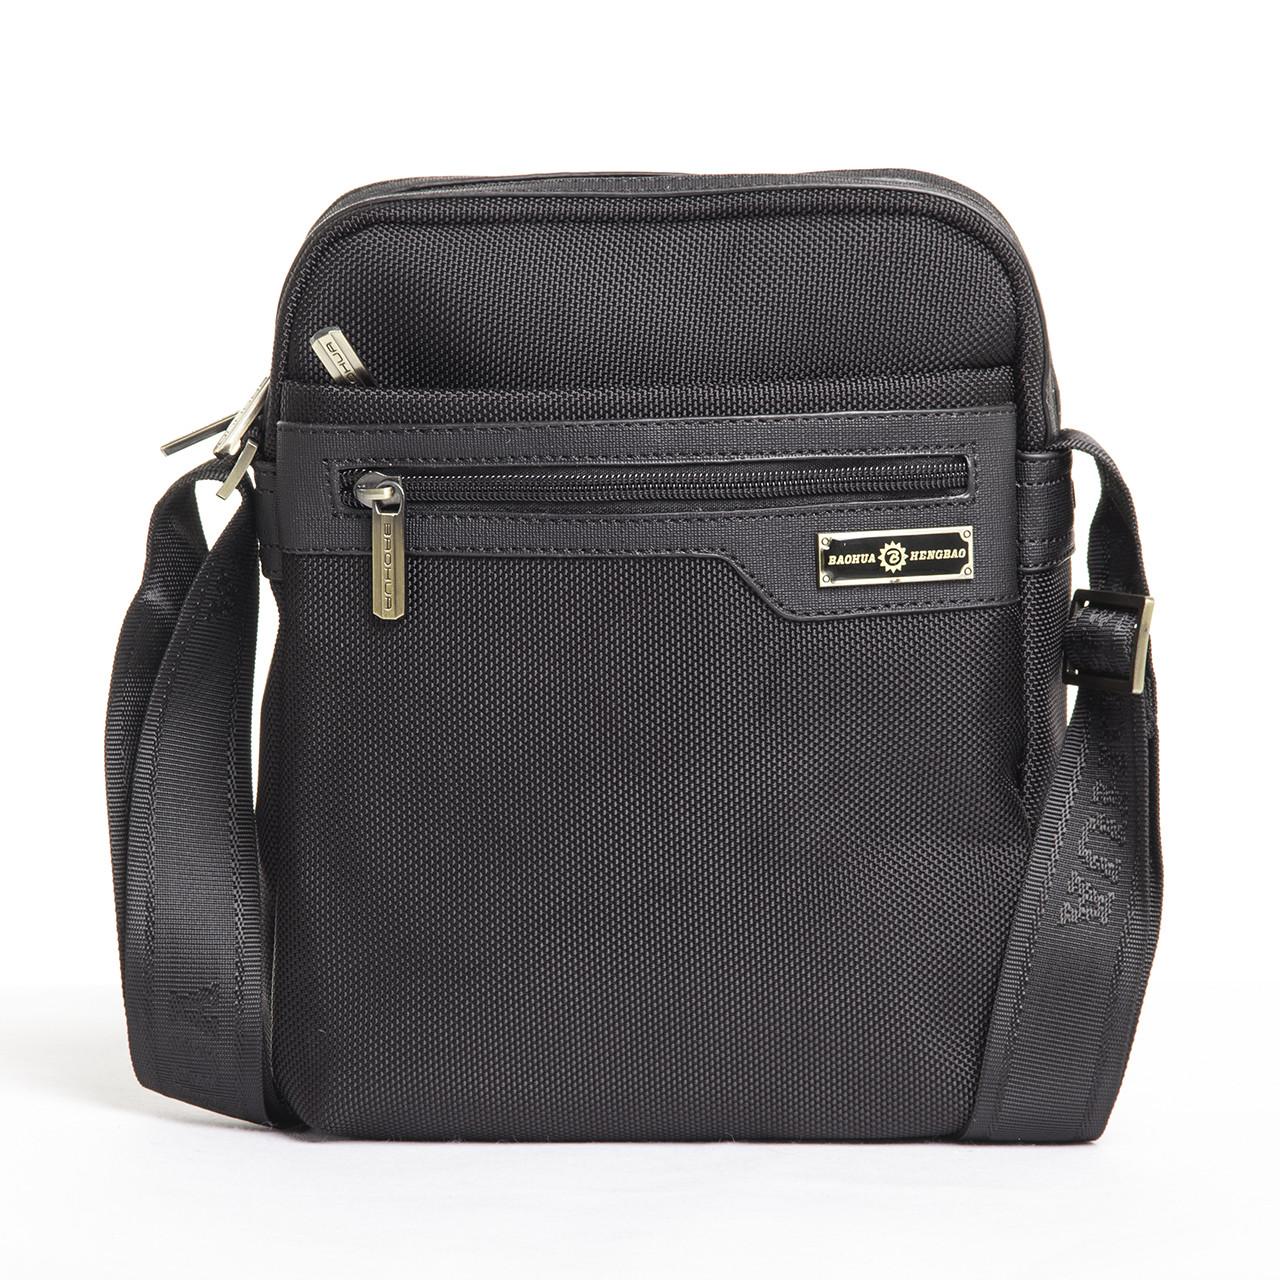 Мужская сумка BAOHUA вертикальная, 21х26х8  ткань Оксфорд ксВН8159-8,75ч